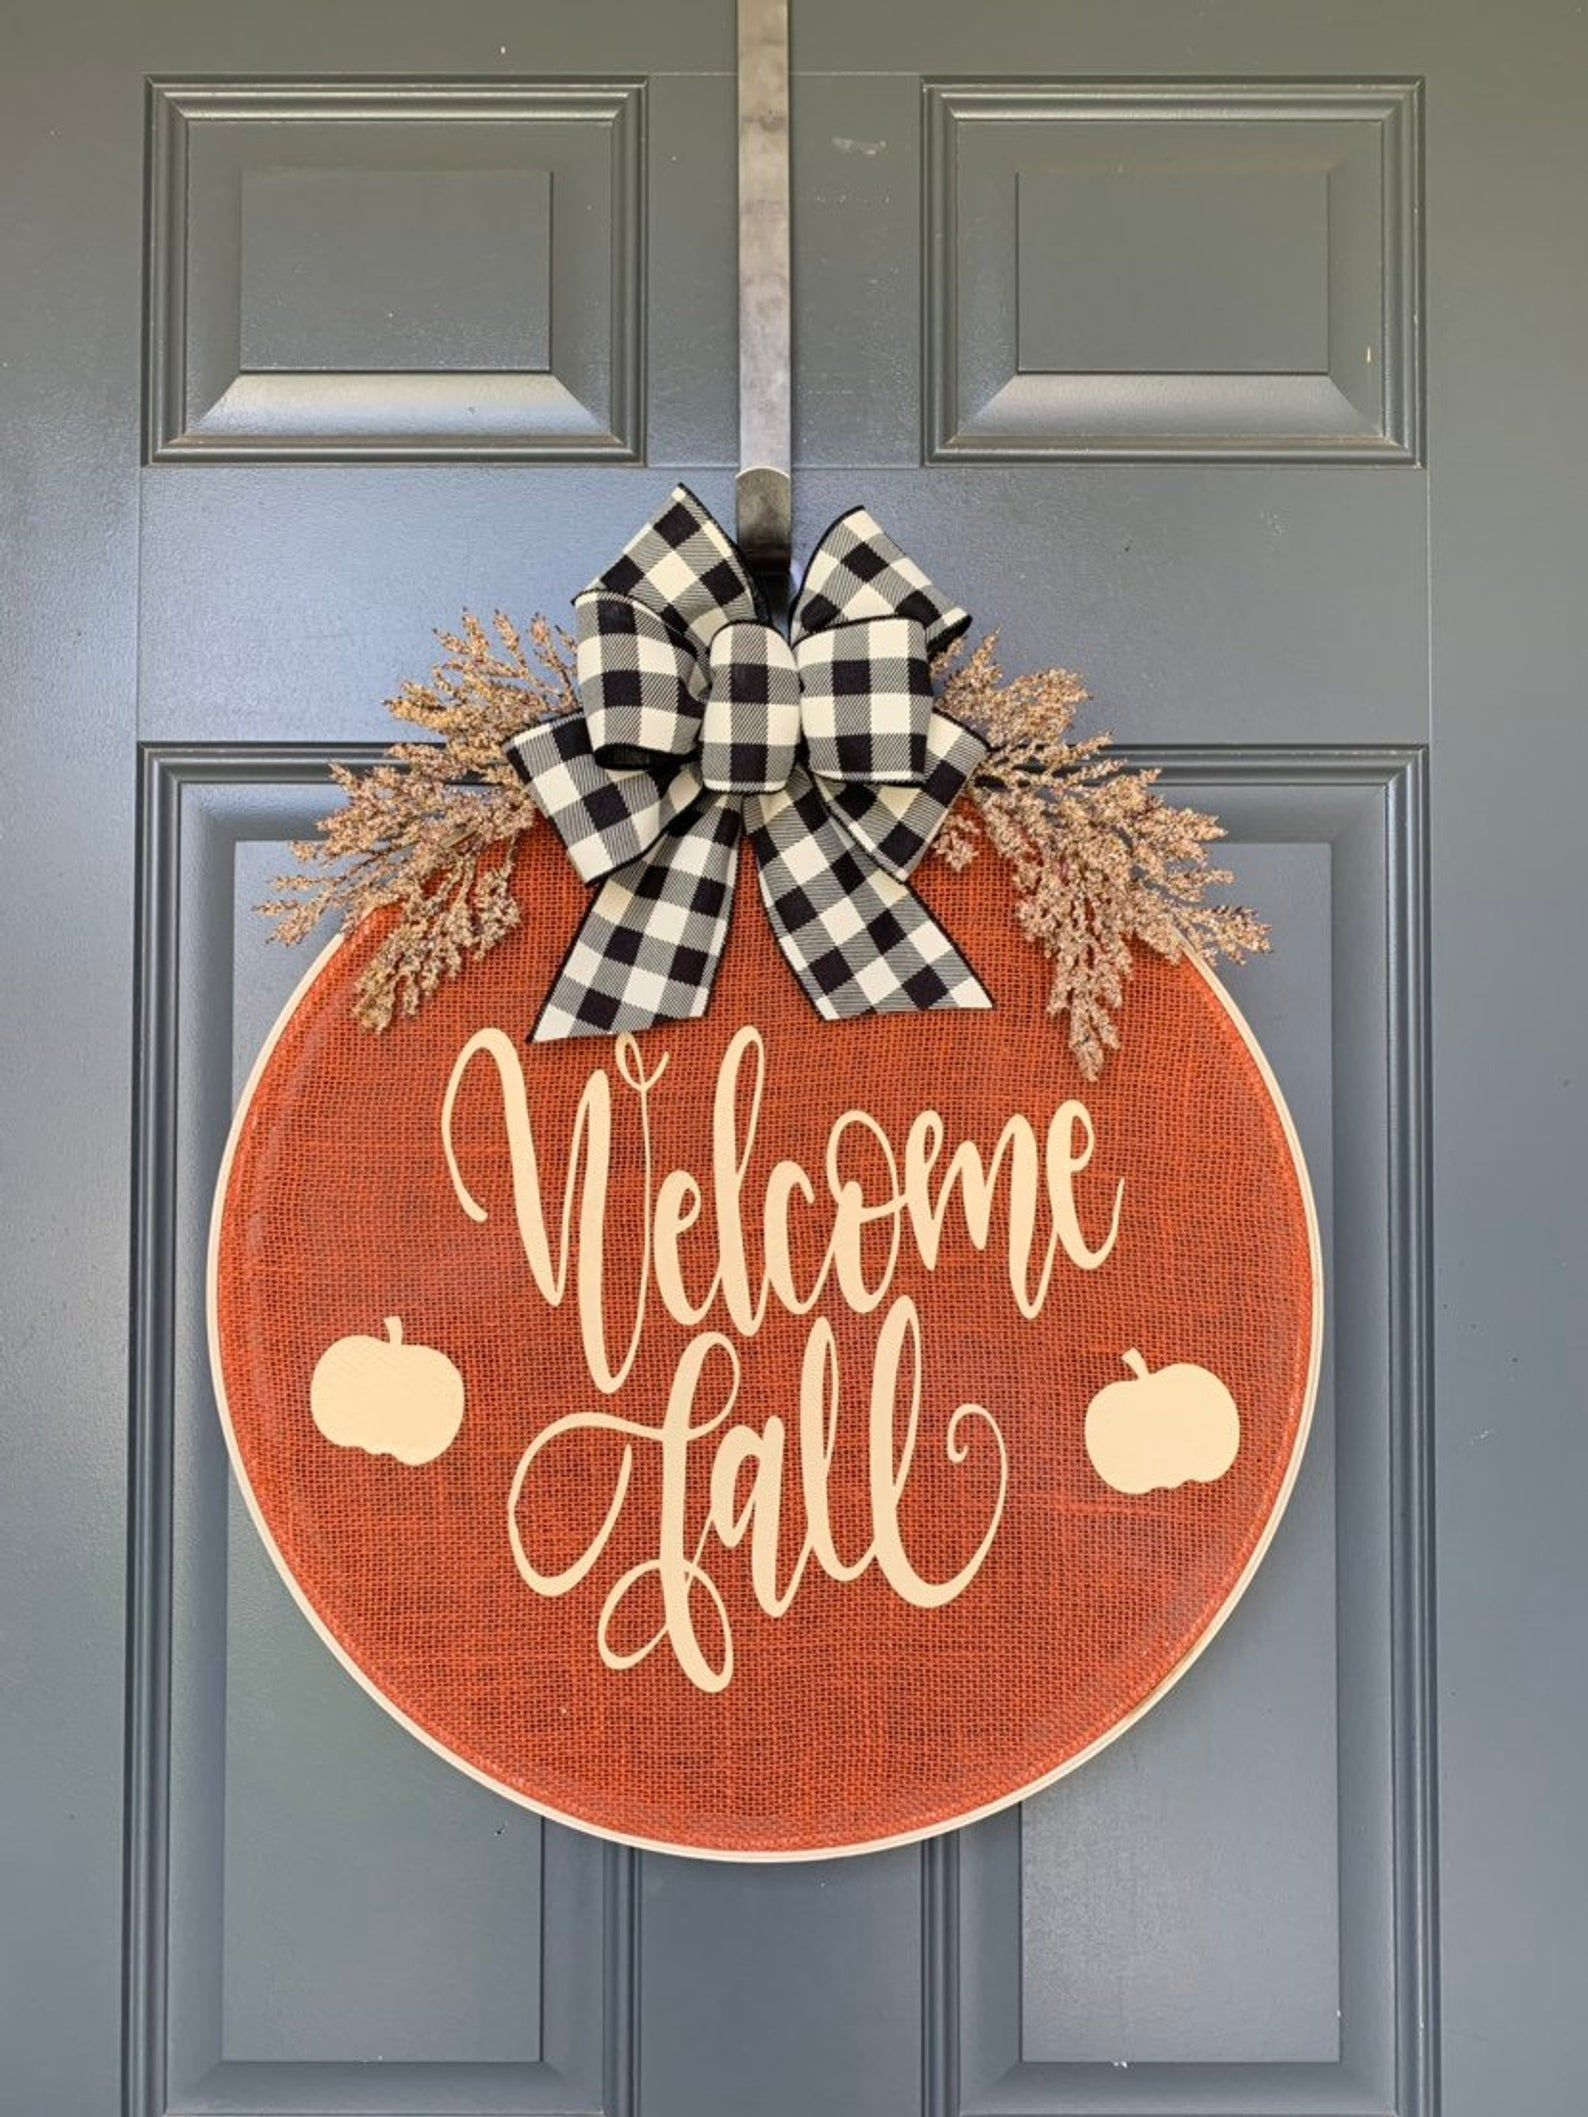 Burlap Wreath Hoop Wreath Fall Wreaths Fall Wreath Fall Wreaths for front door Wreaths for Front Door Wreath for Front Door